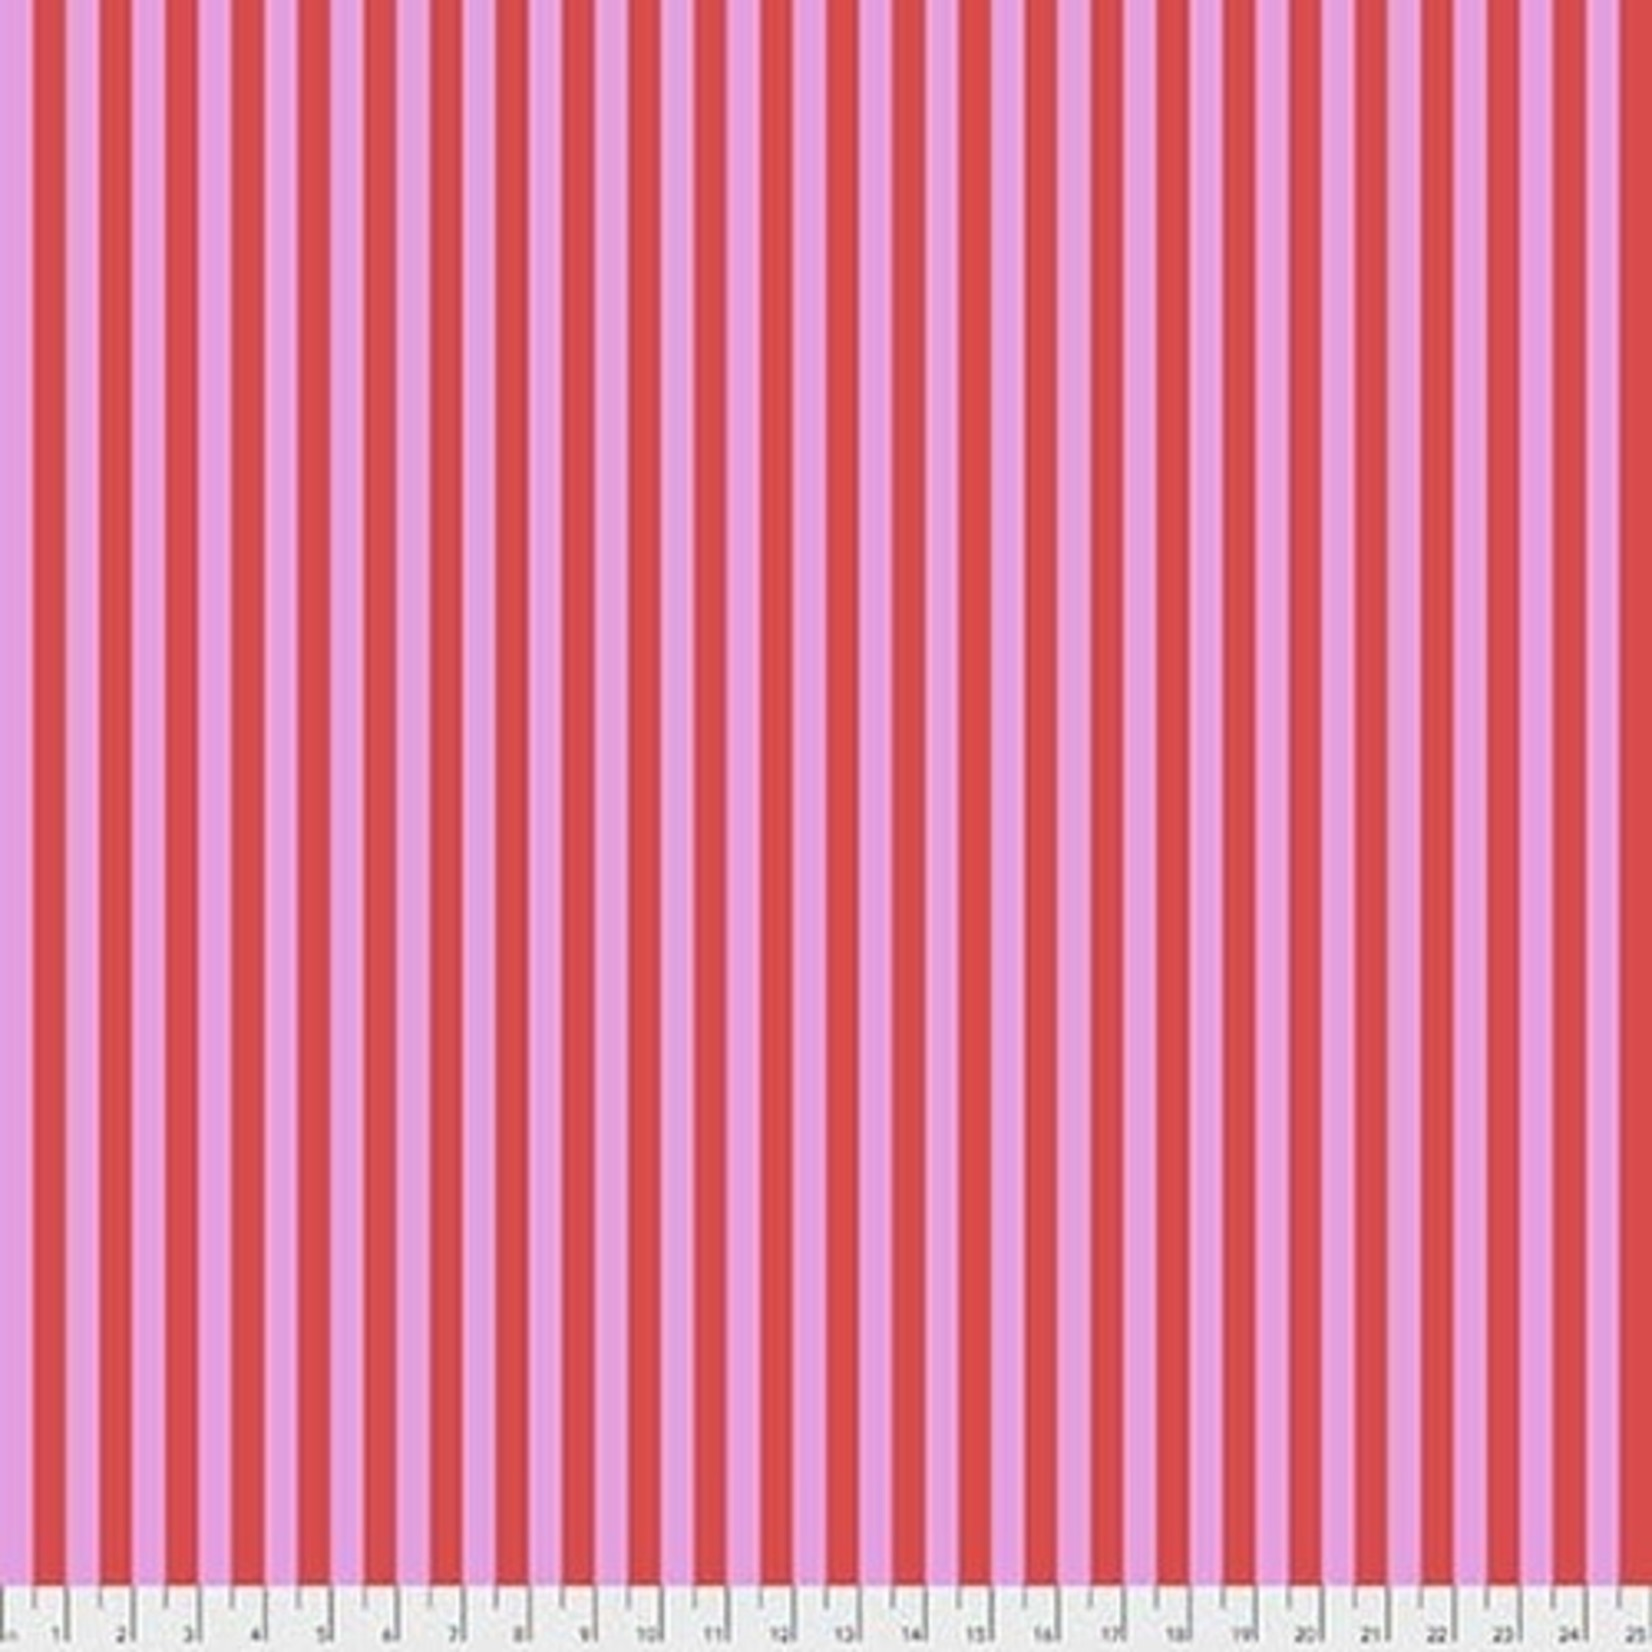 Tula Pink Tula Tent Stripe- Poppy 0.17 per cm or $17/m